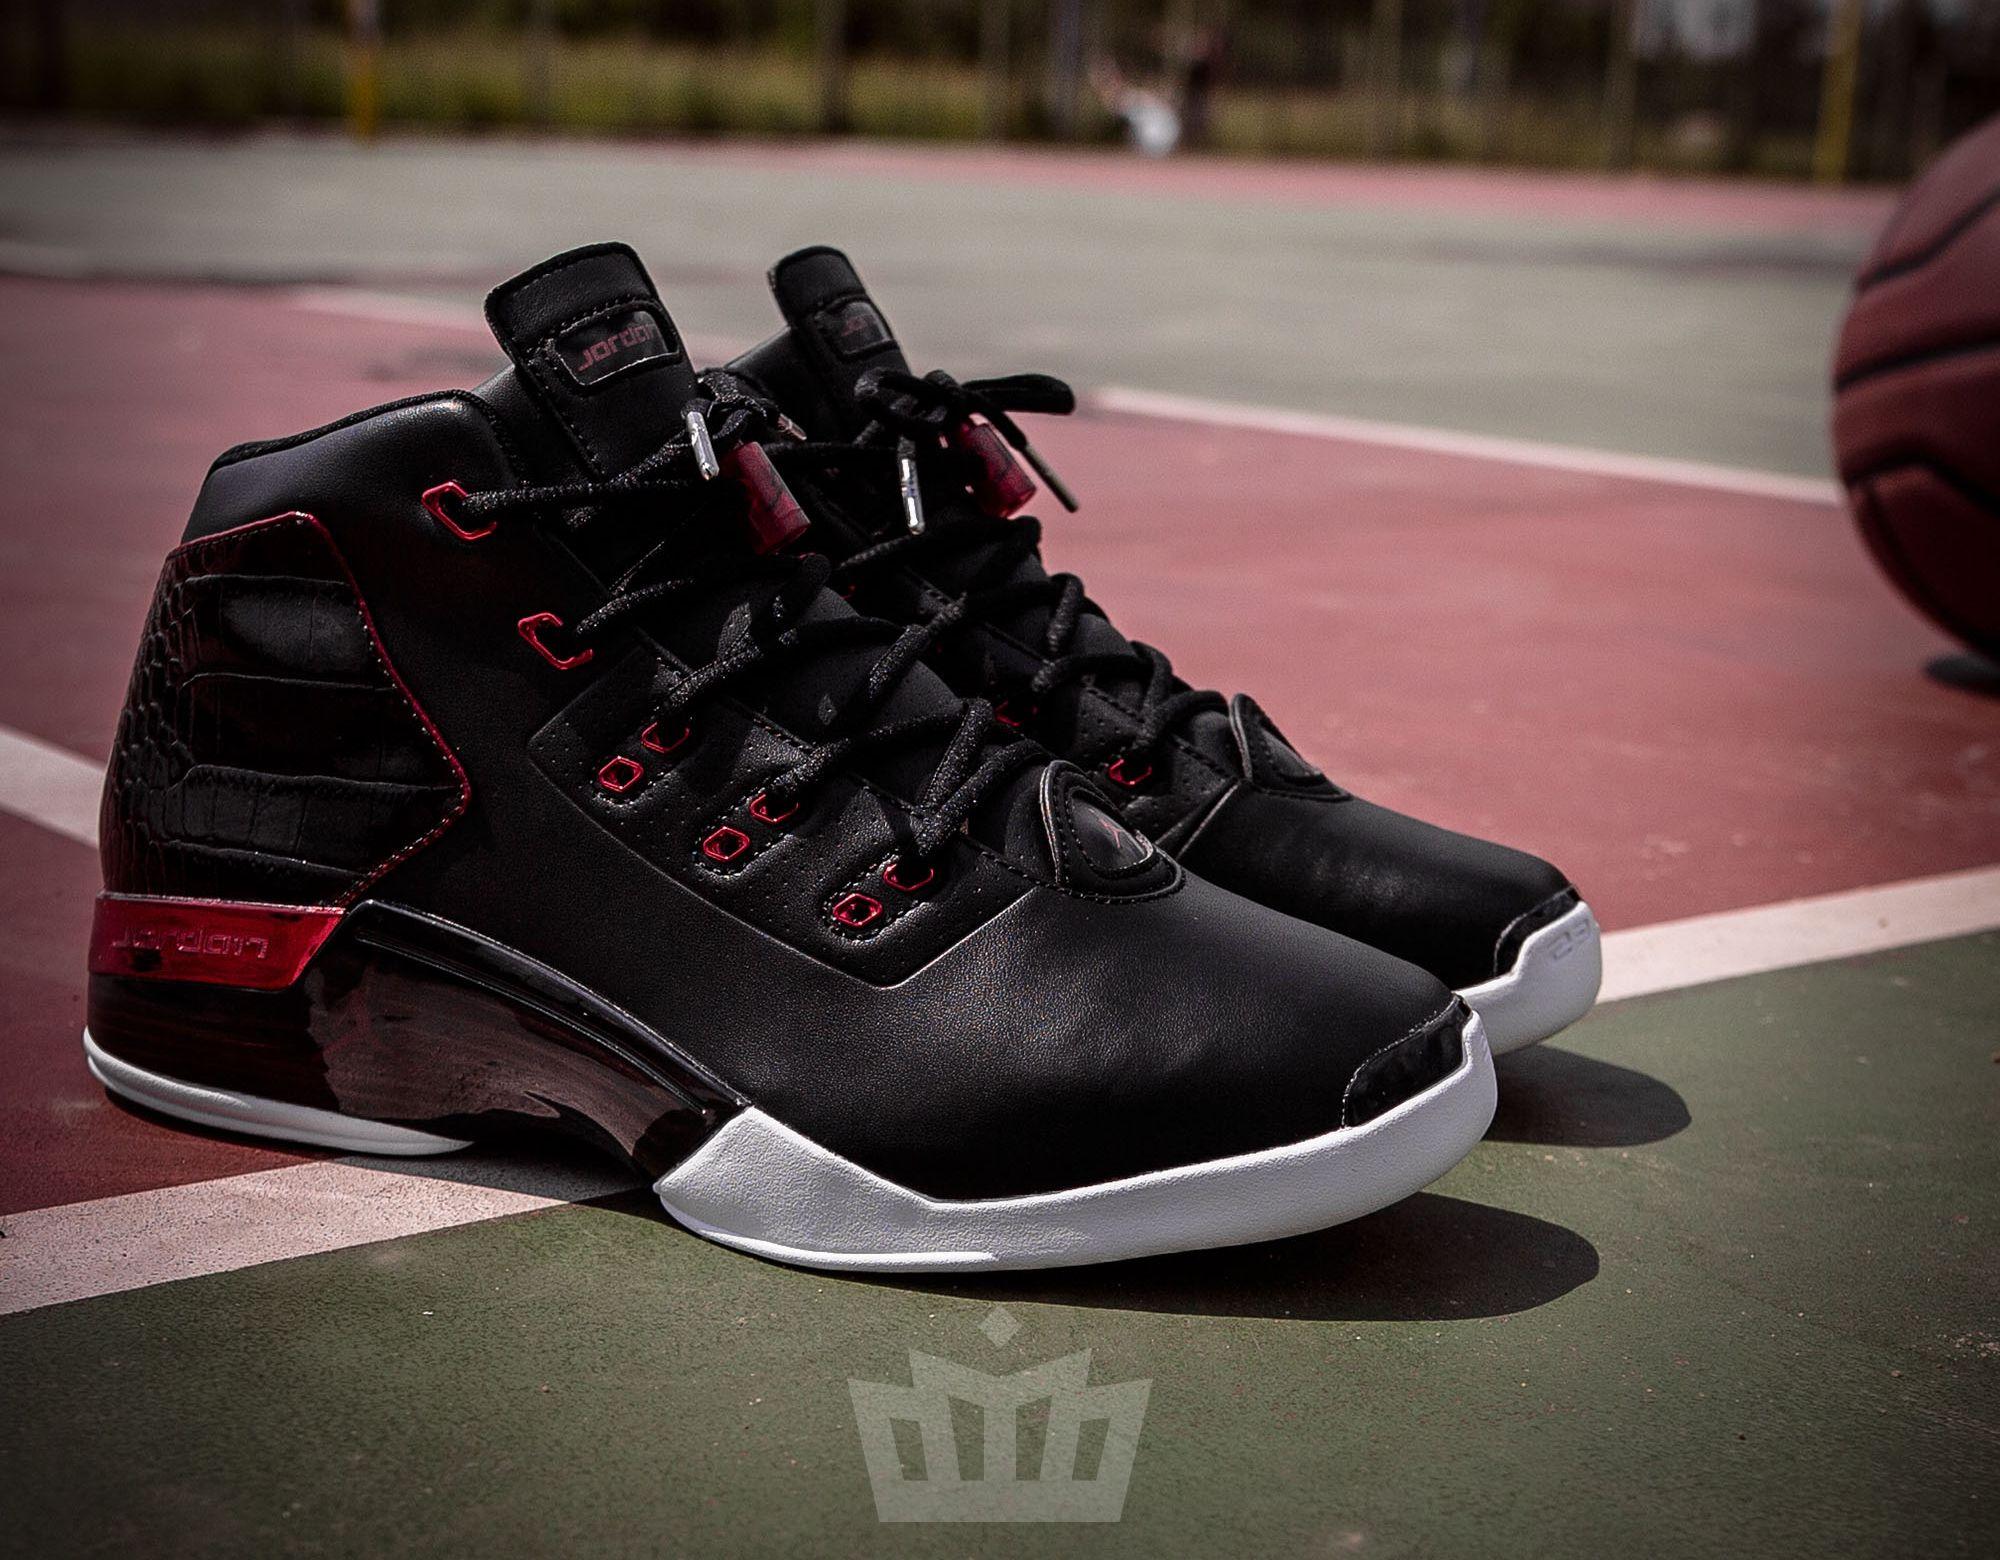 Air Jordan 17+ Bulls Release Info 832816-001 Chaussures Officiel Jordan  prix Pour Homme   Air Jordan 17+   Pinterest   Air jordan and Nike air  jordans